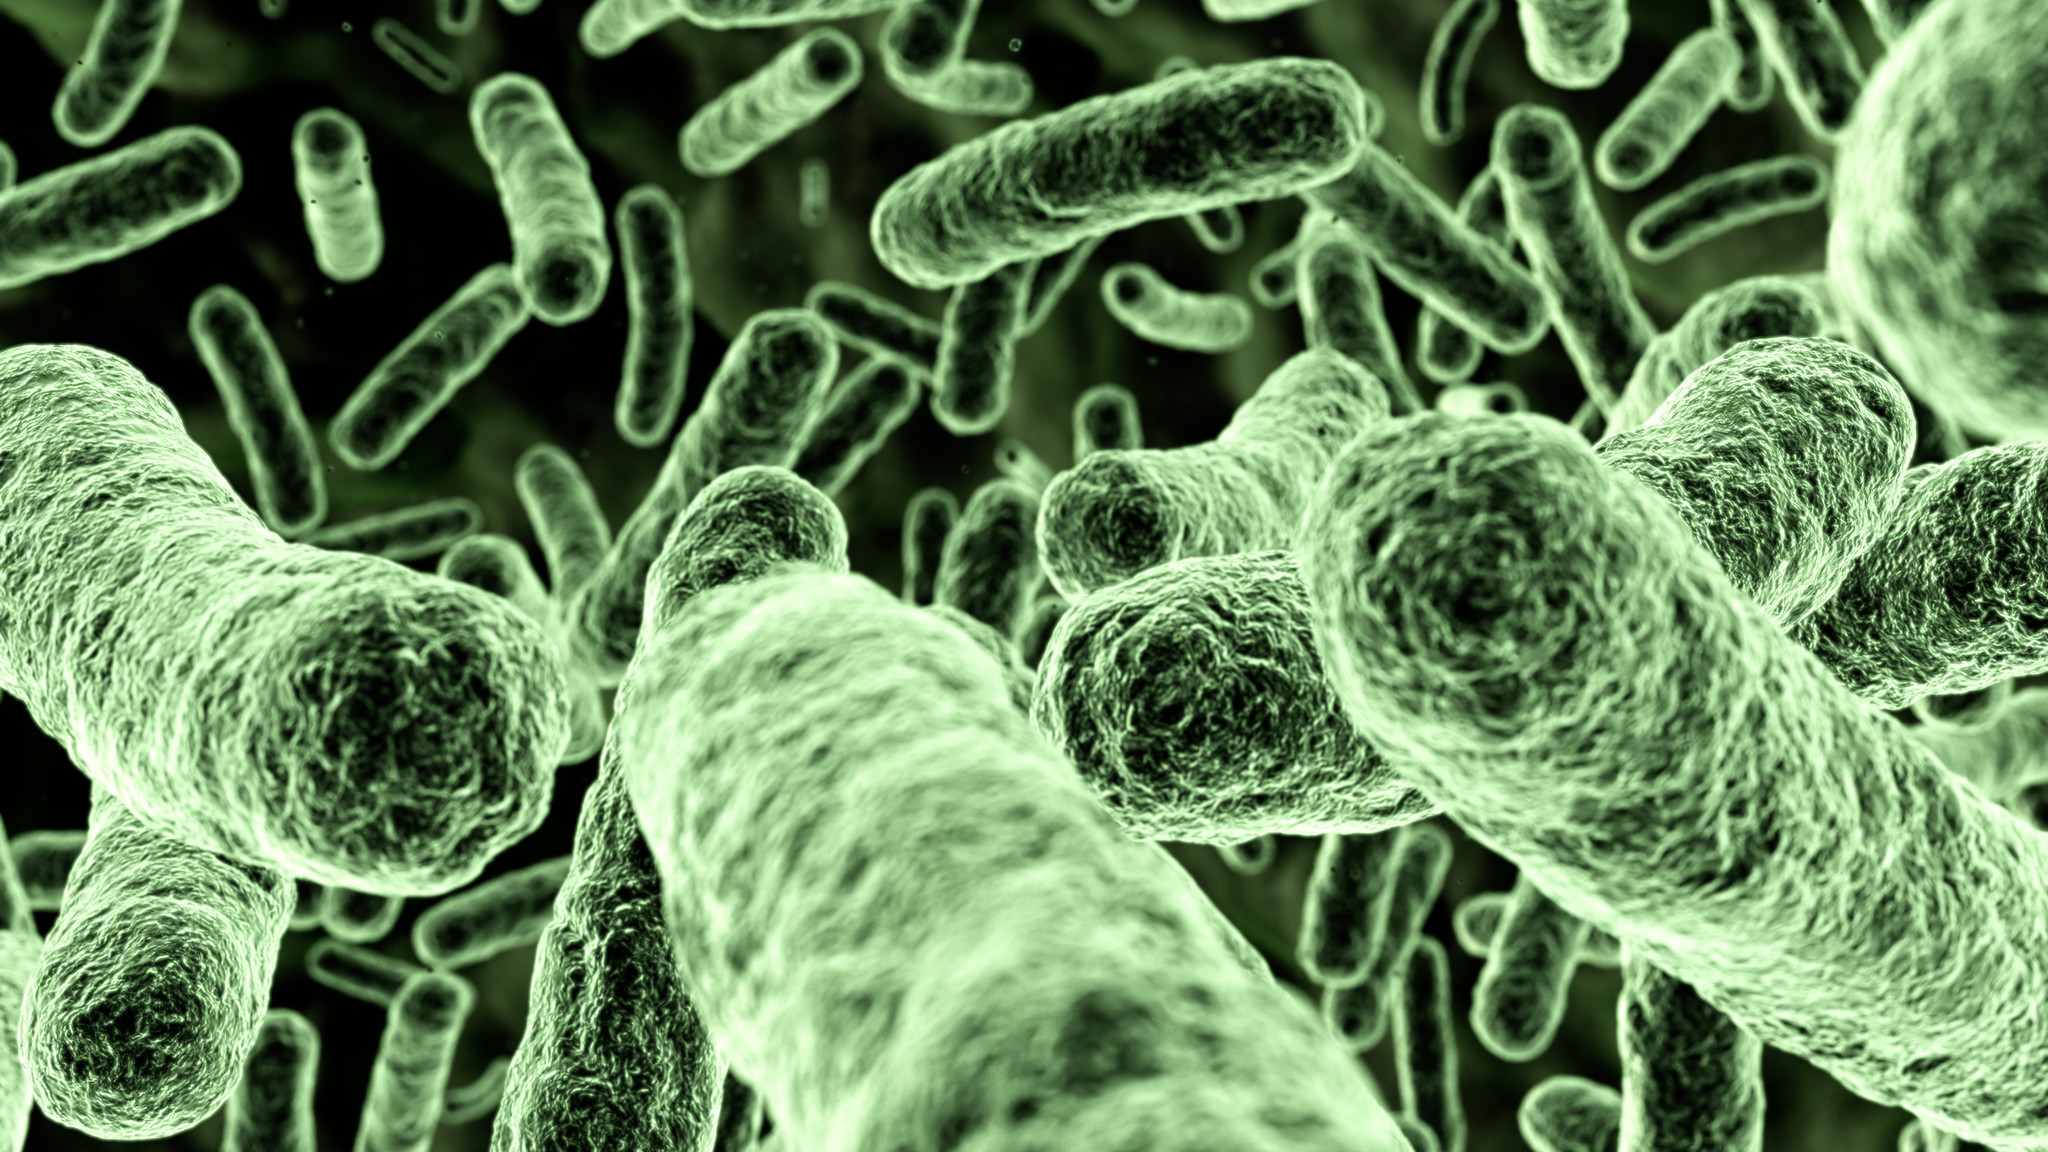 Bacteria Myrtle Beach Eat Flesh